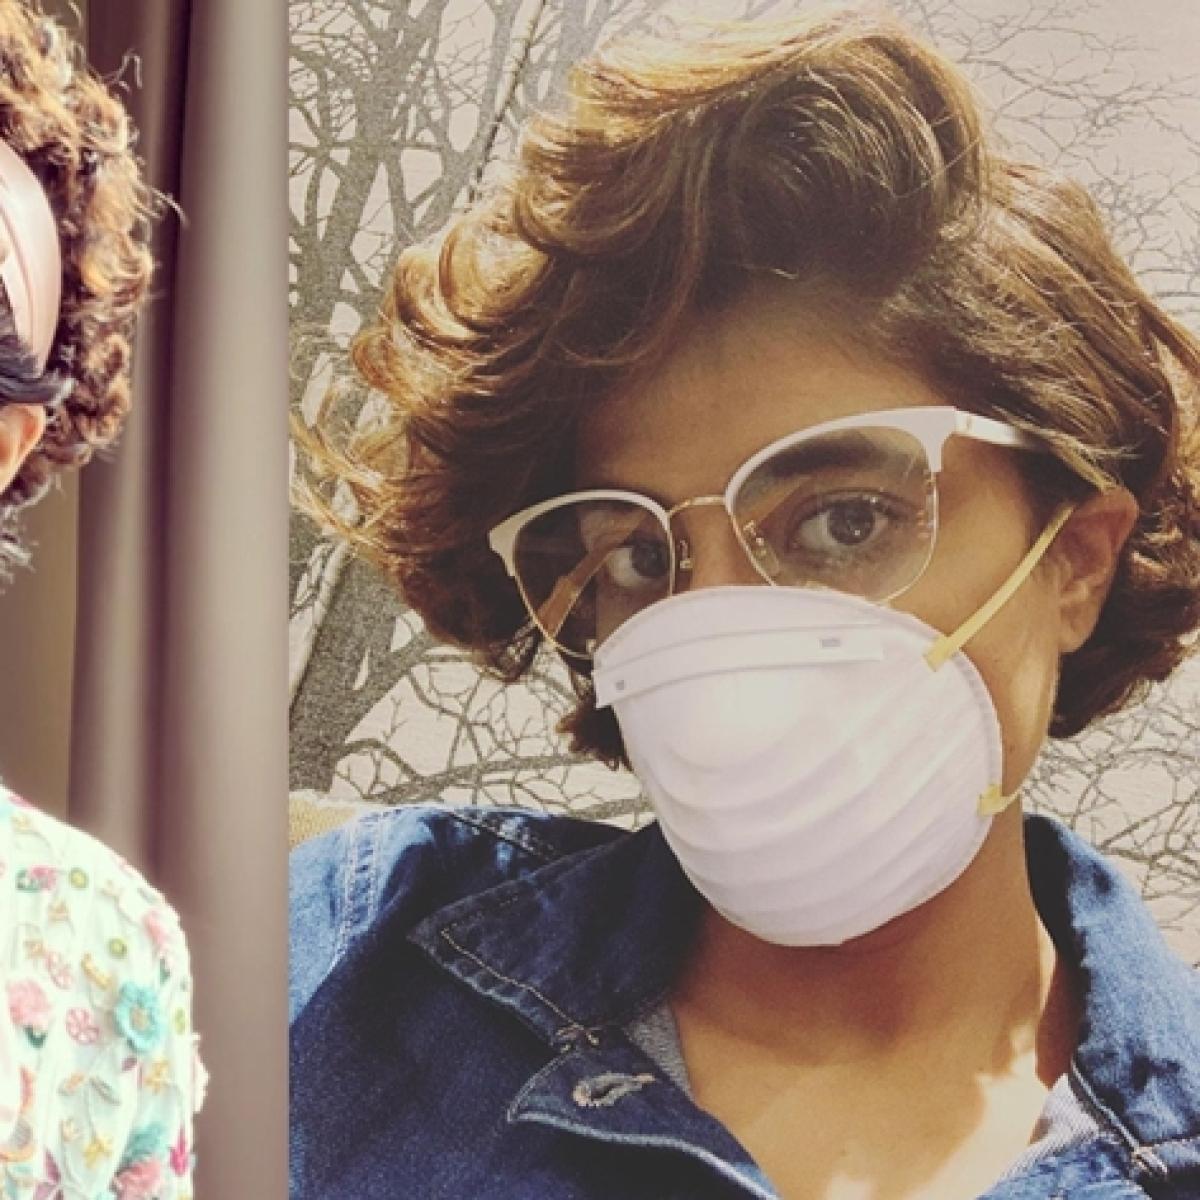 'The sight in itself started giving me anxiety': Tahira Kashyap on coronavirus